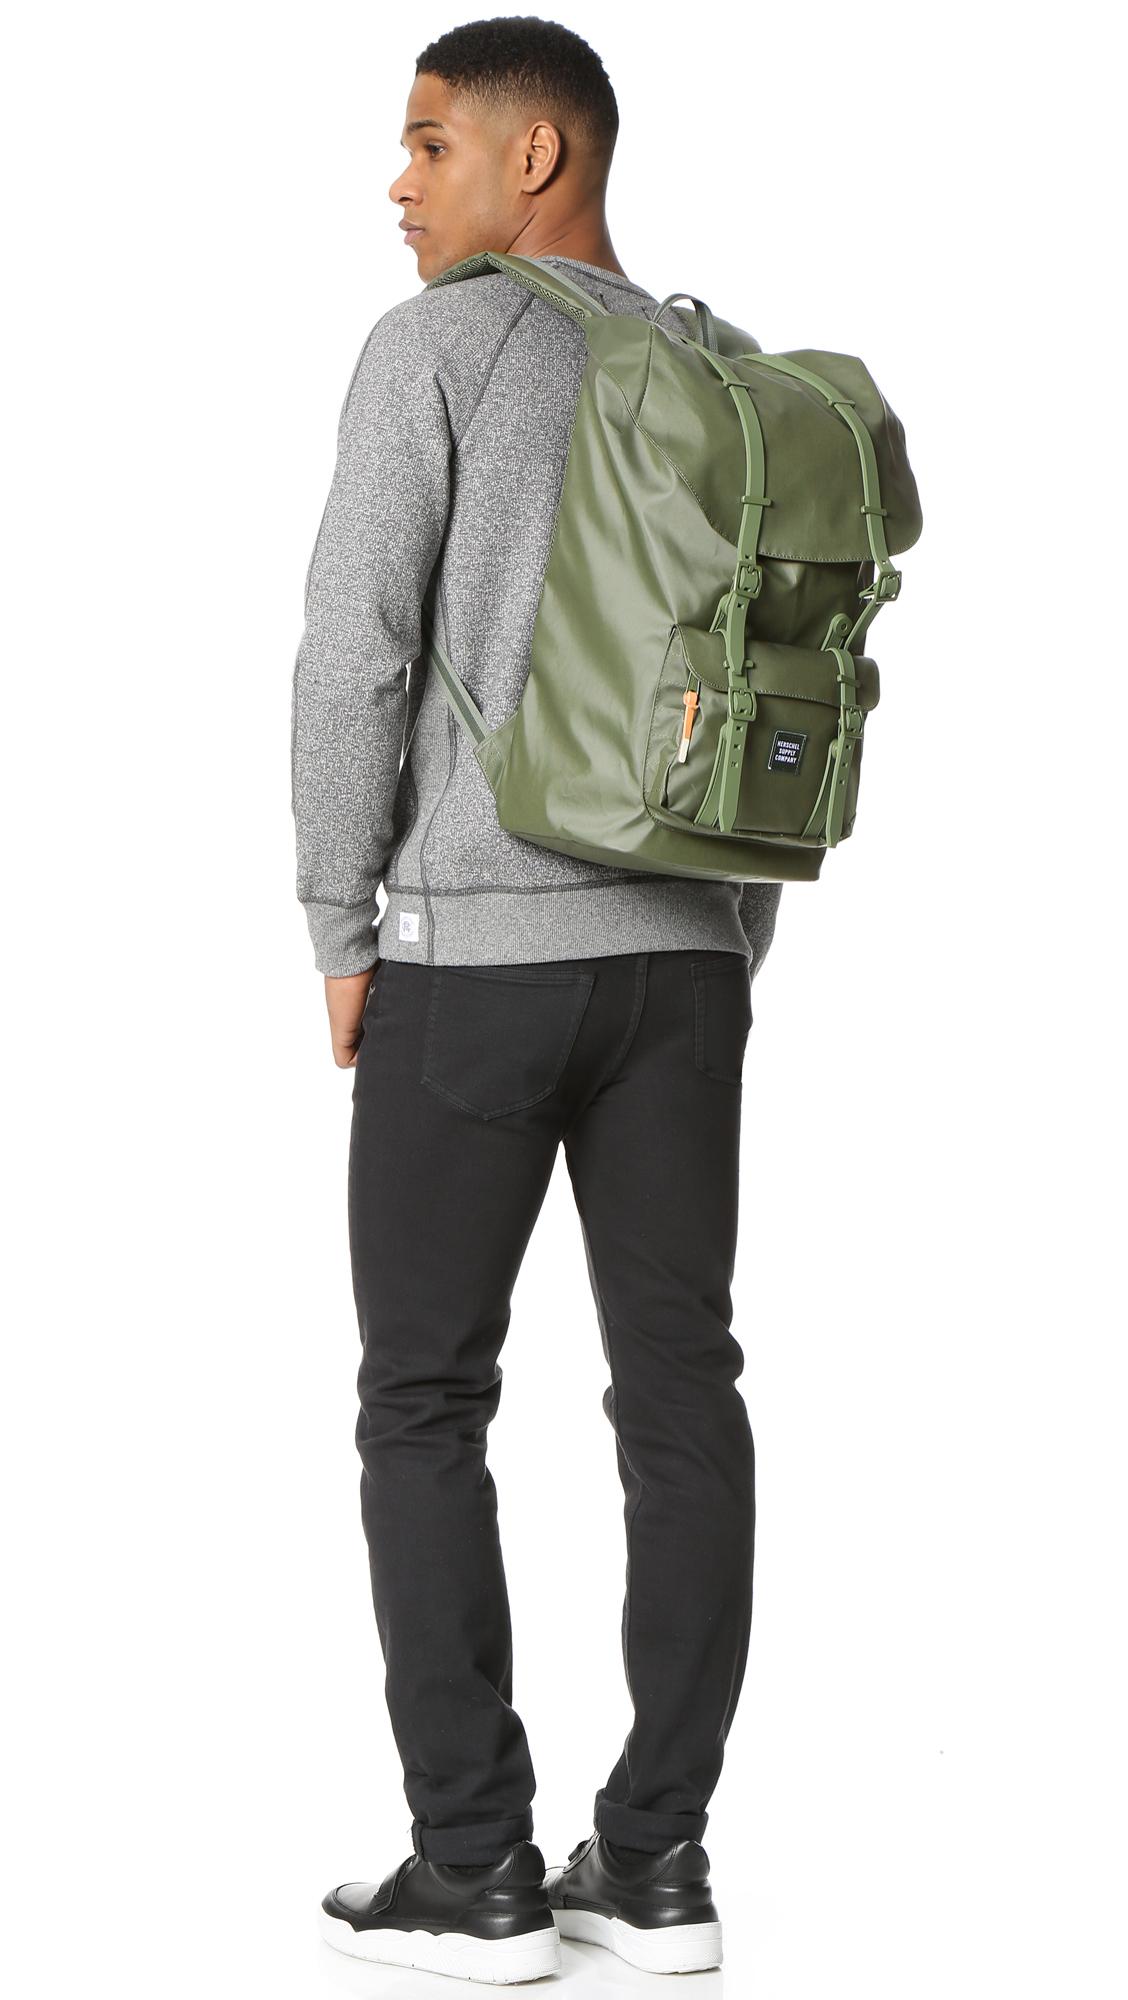 Lyst - Herschel Supply Co. Studio Little America Backpack in Green ... 65d0a4dbd5d04